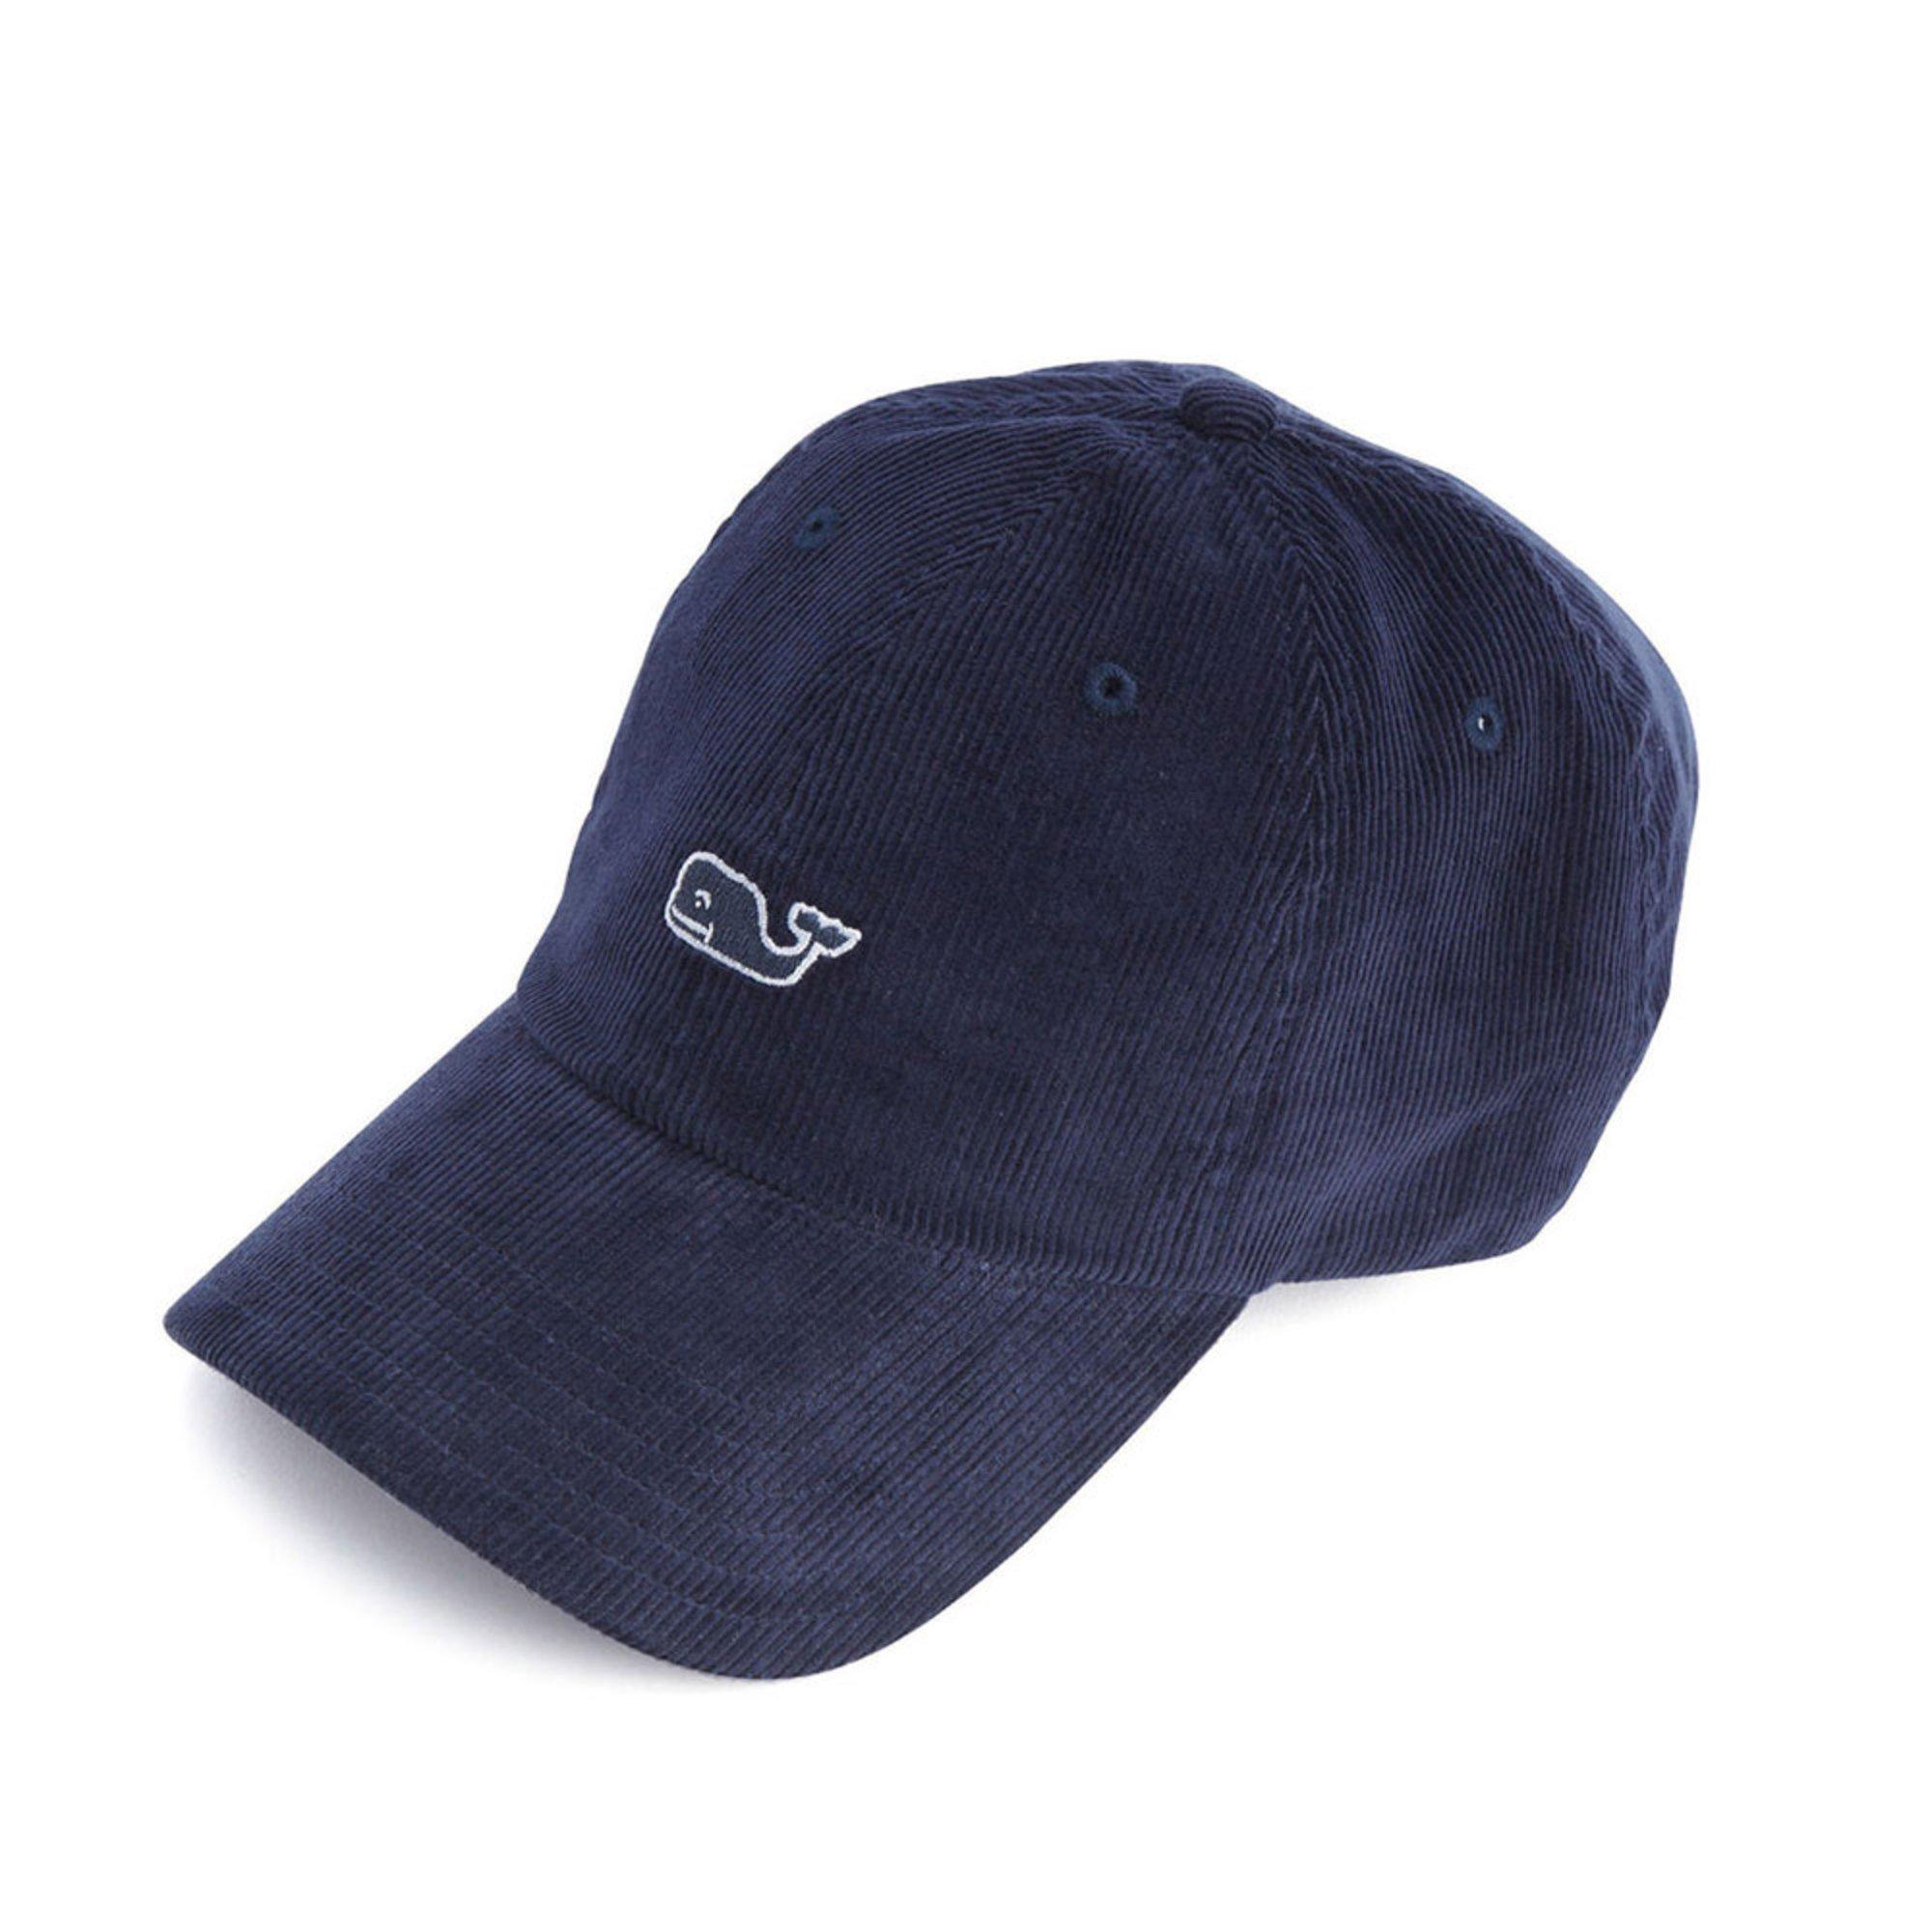 vineyard vines s corduroy baseball hat s